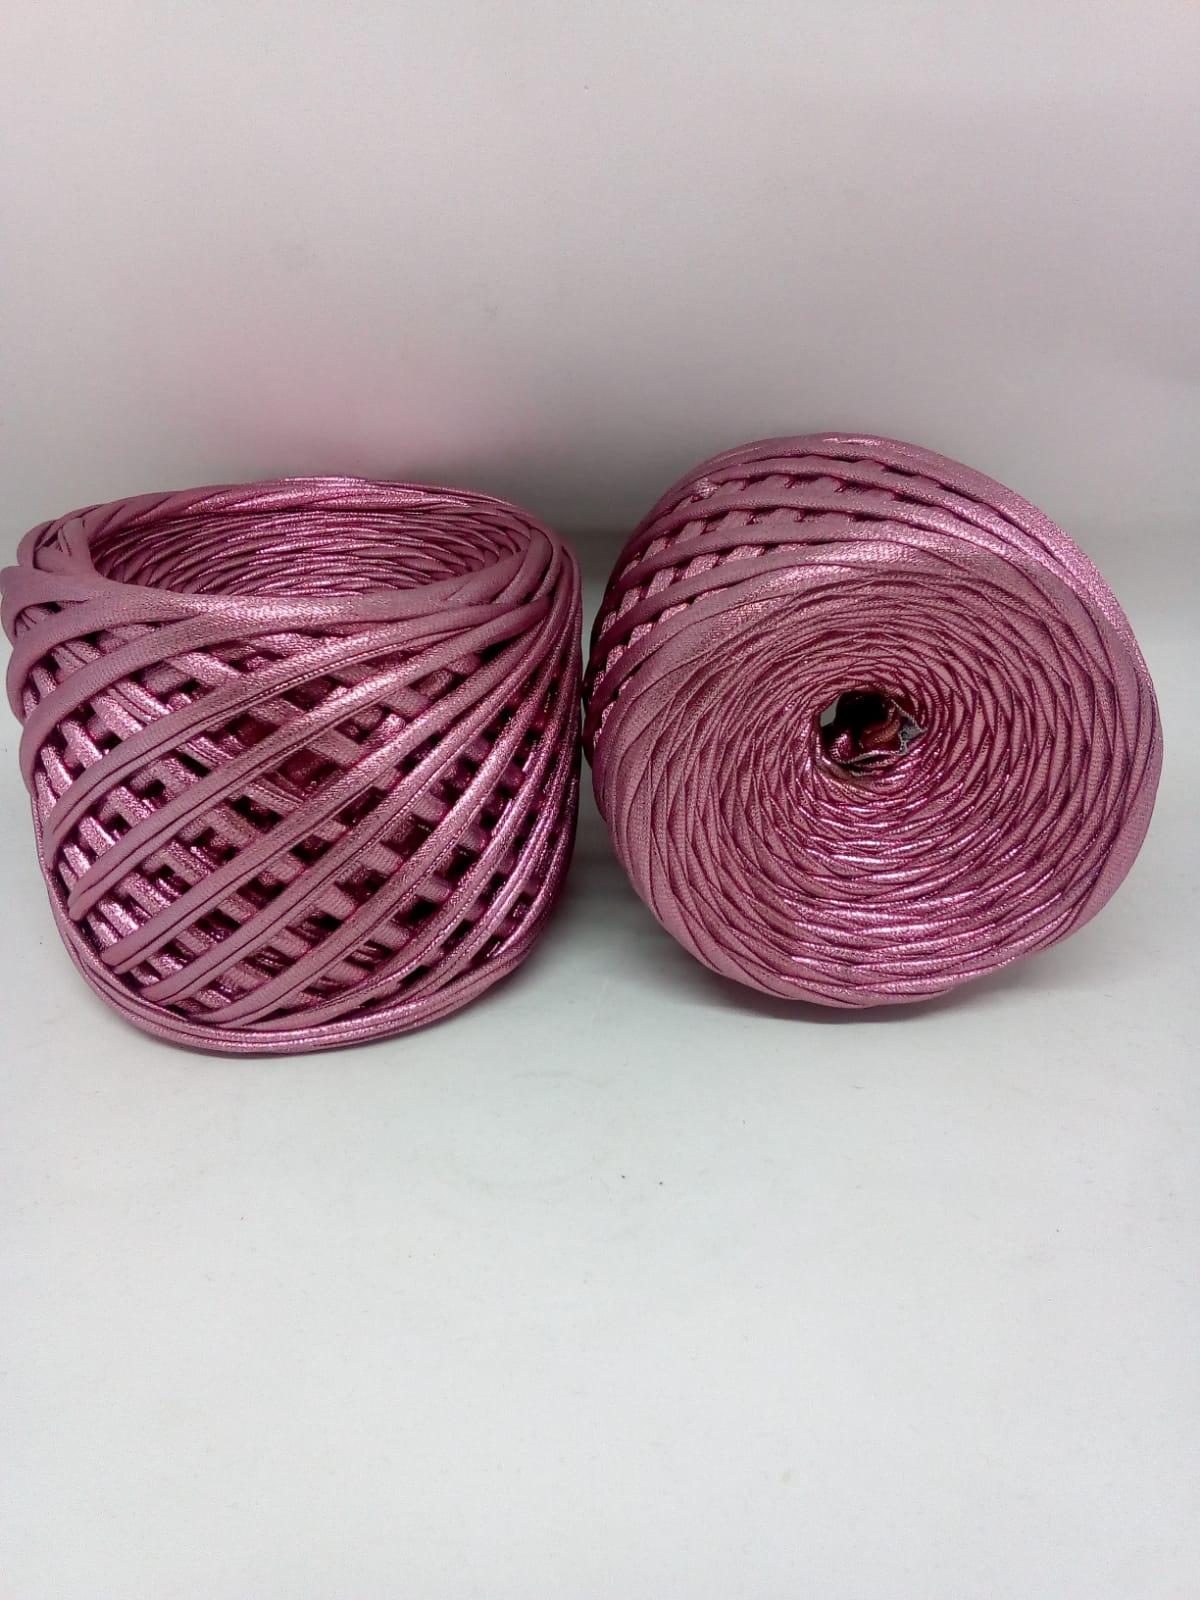 Maccaroni Metallic (Маккарони металика) 6 - мерцающий розовый купить с доставкой по Беларуси